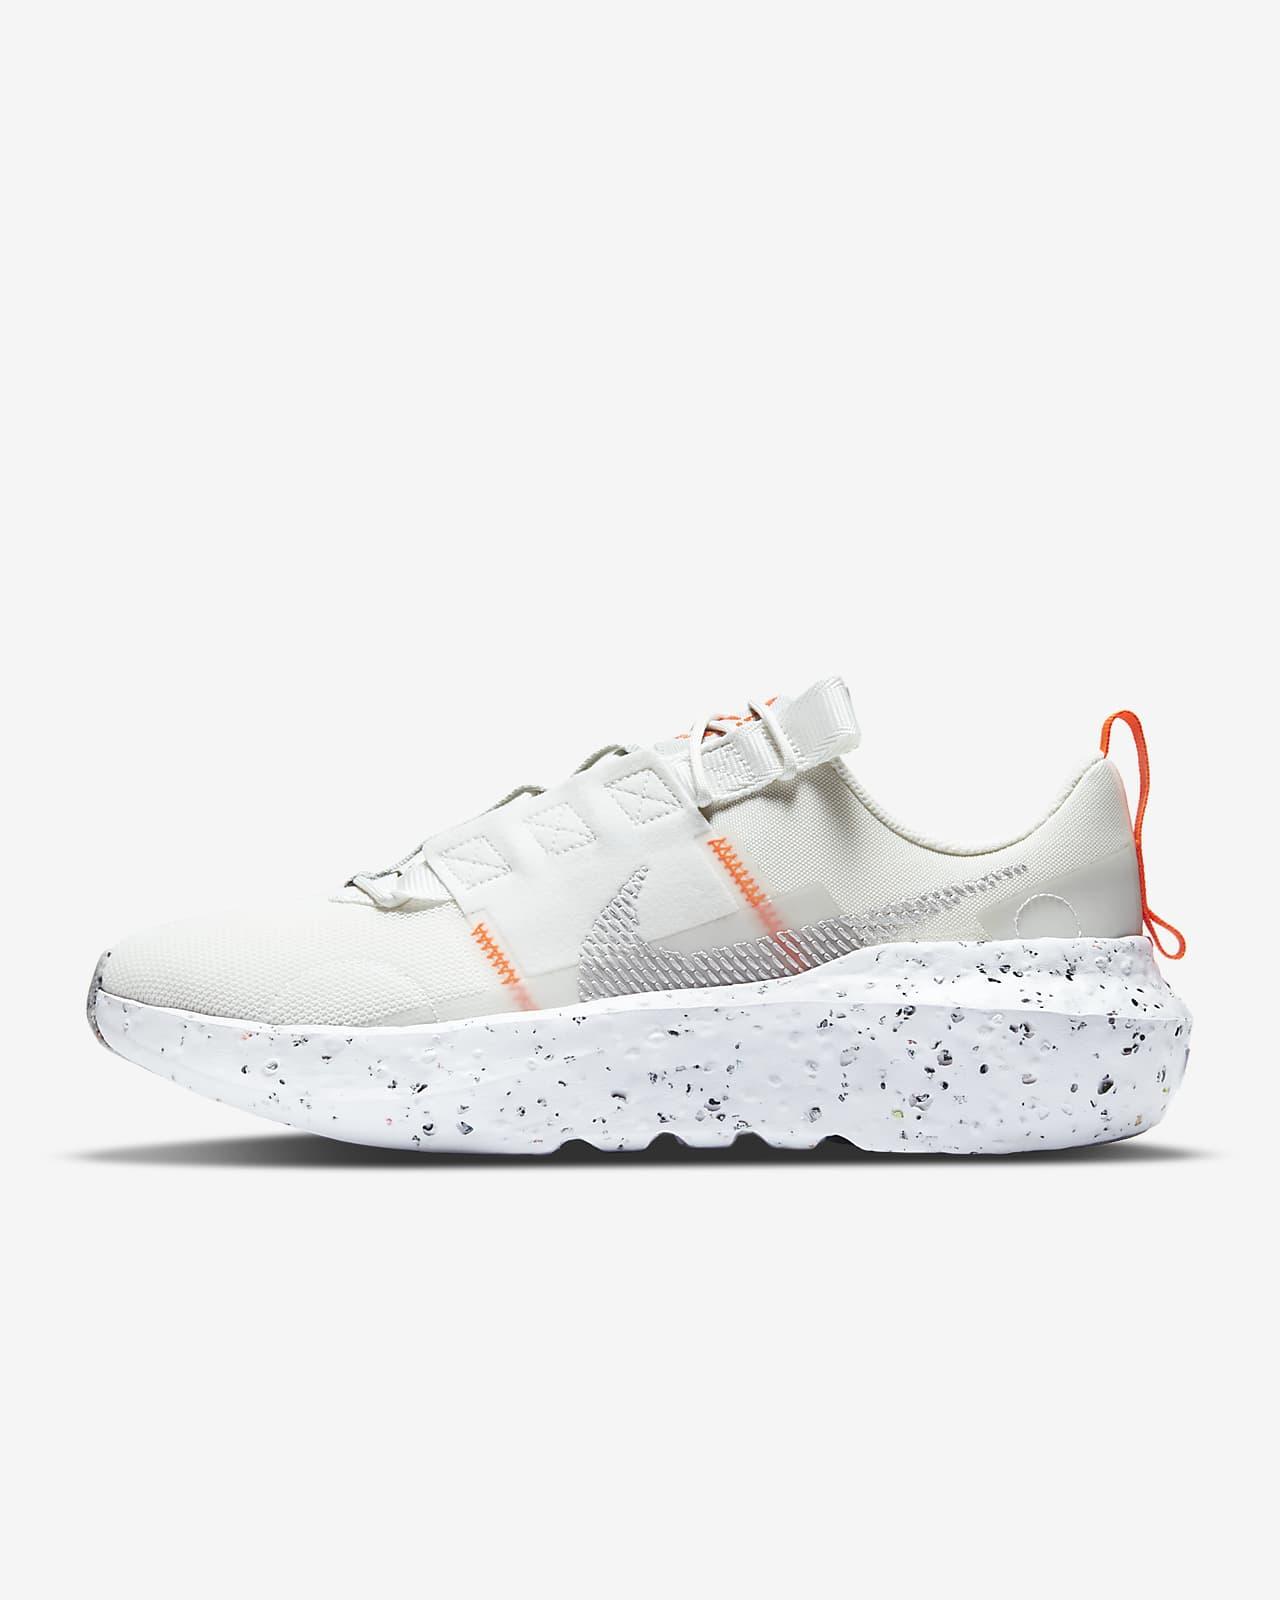 Nike Crater Impact Men's Shoe